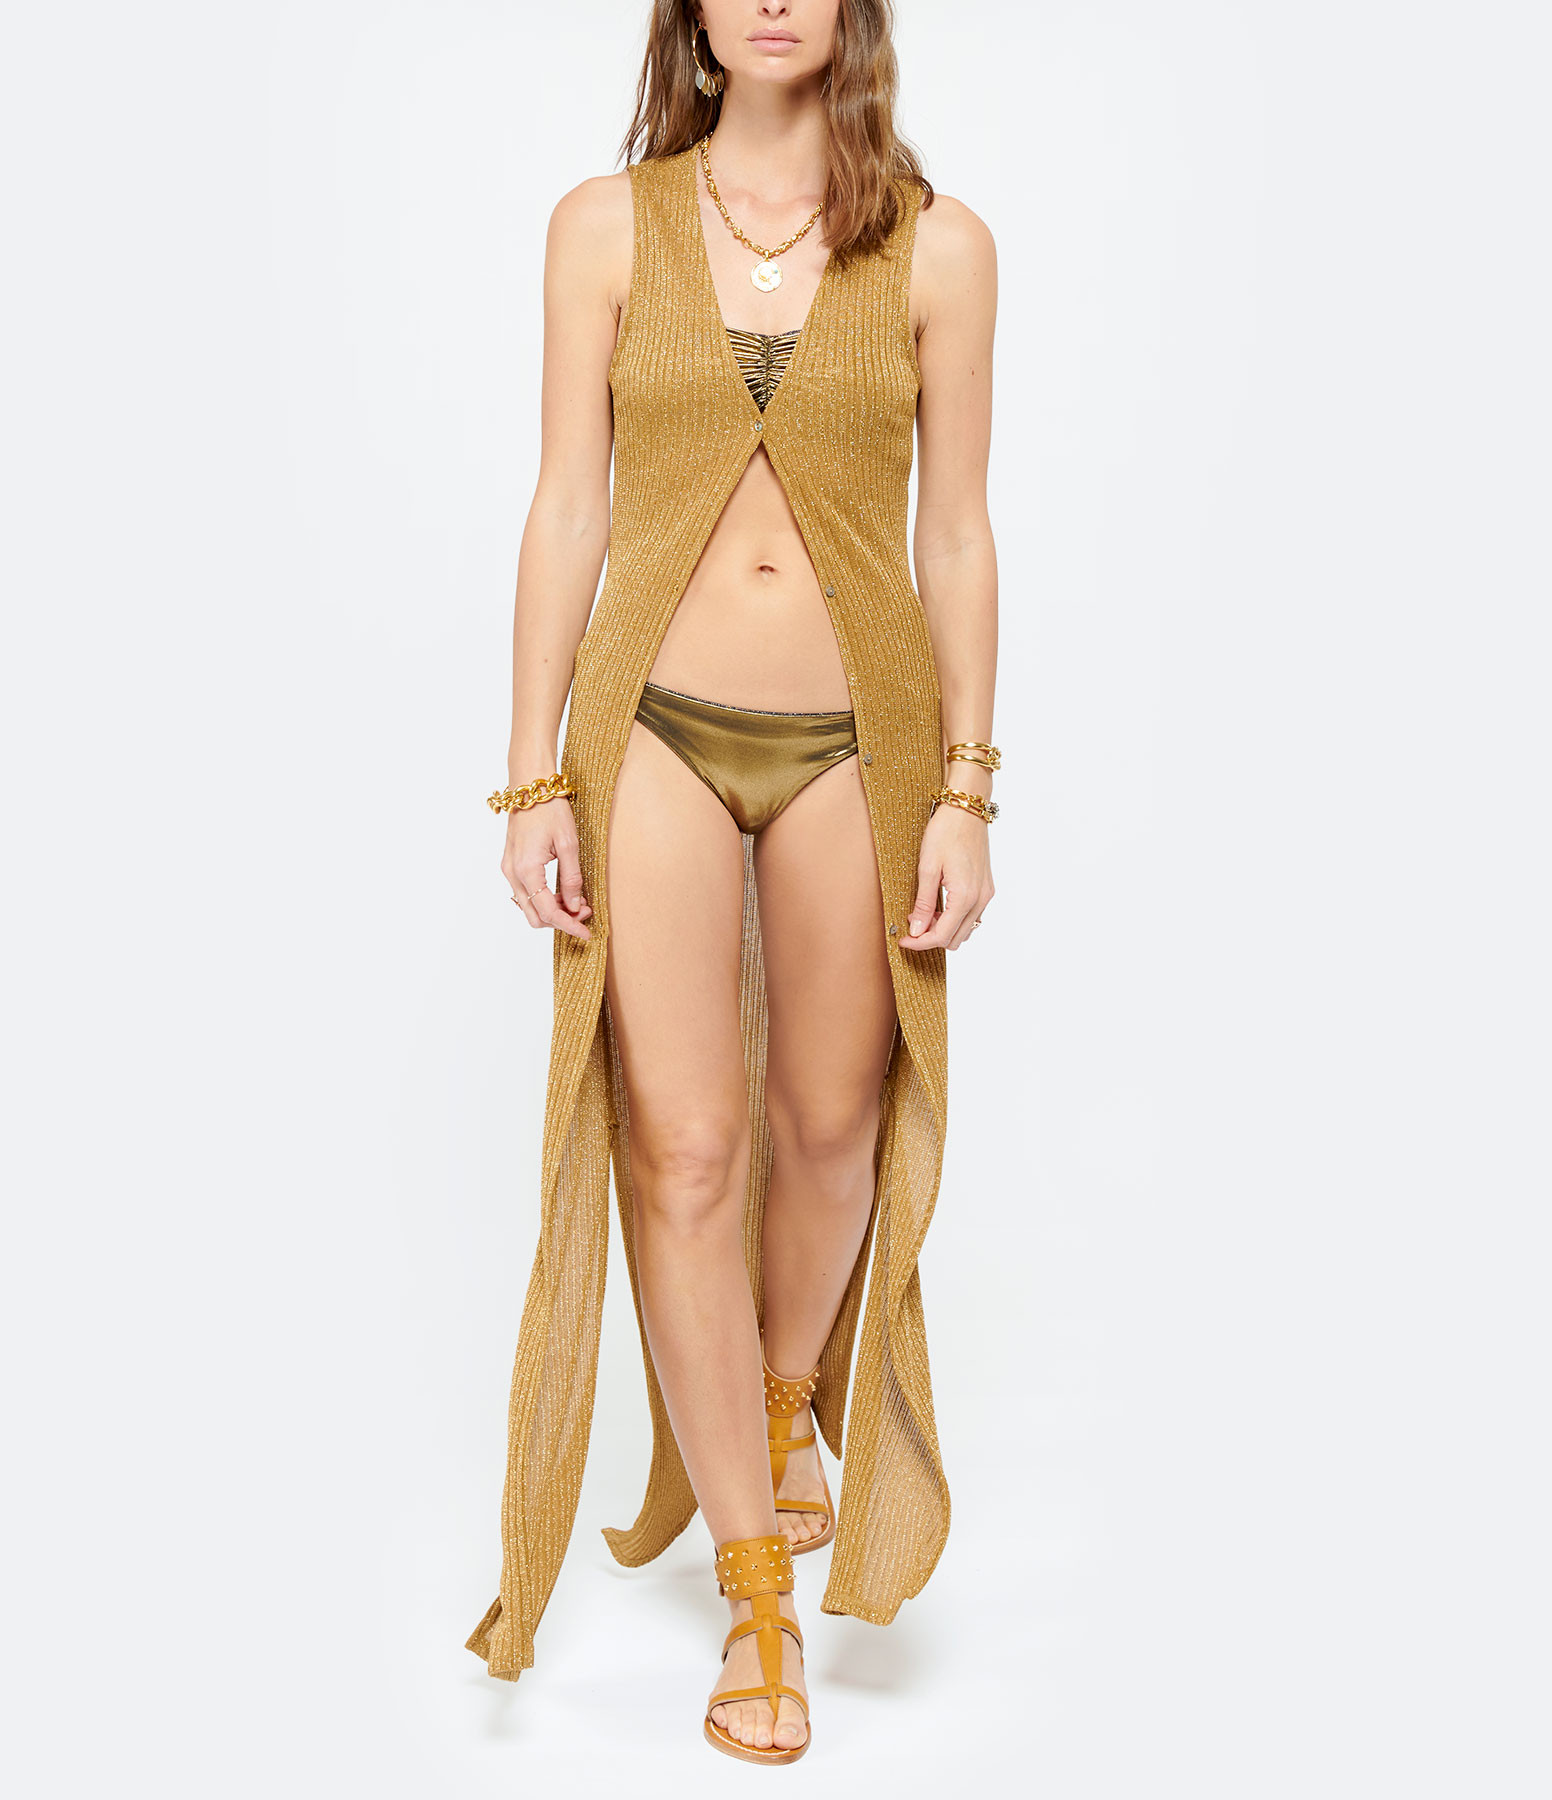 BELIZA - Robe Ima Maille Lurex Doré